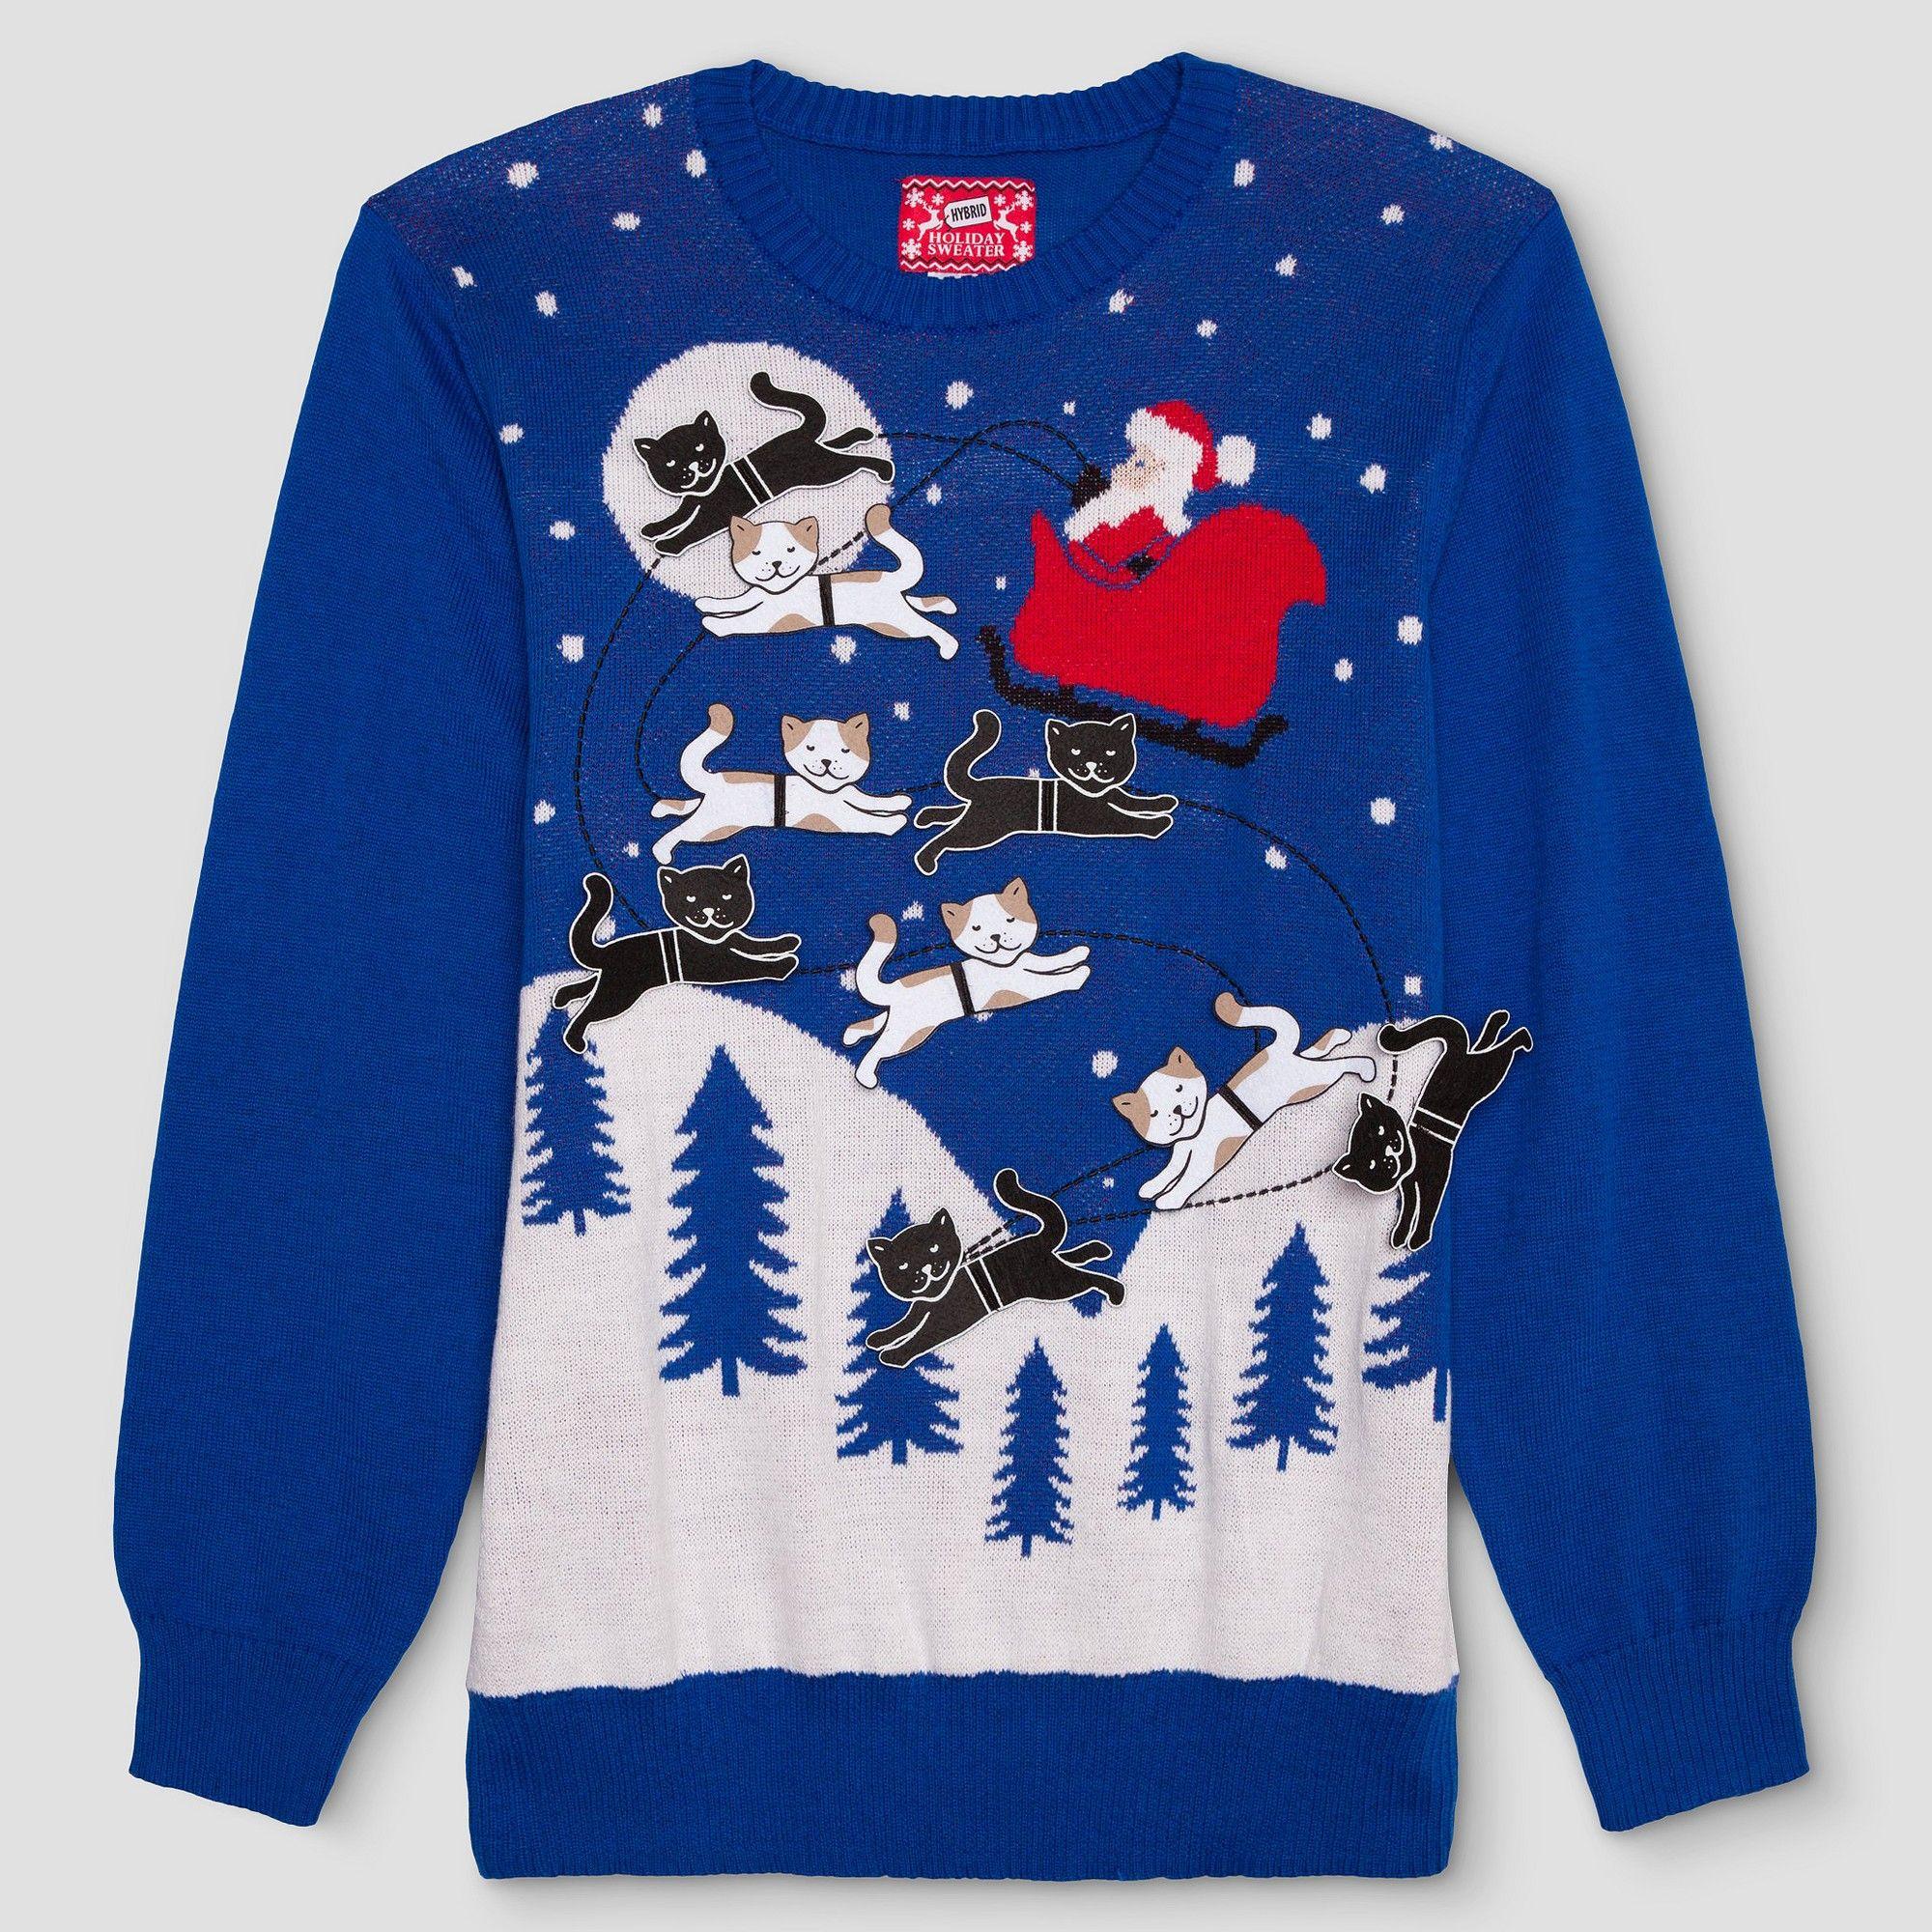 Mens Big Tall Ugly Holiday Santa With Felt Cats Sweater Blue